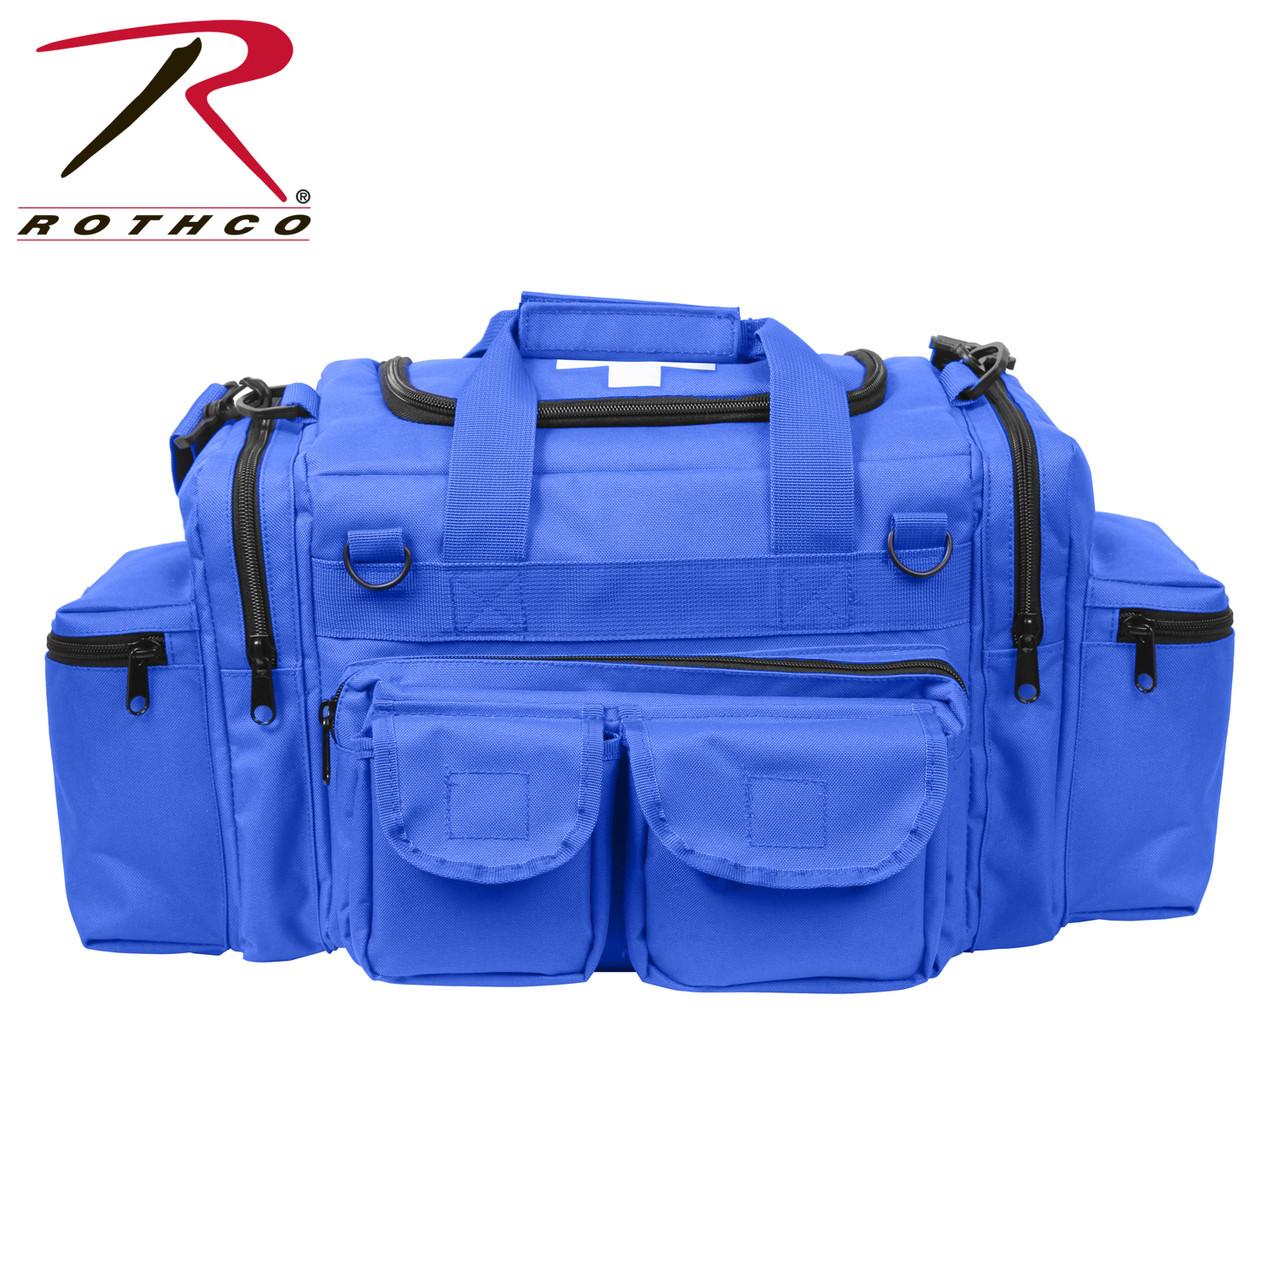 Rothco EMT Medical Trauma Kit  | Rothco 1145 | EMT First Aid Kit